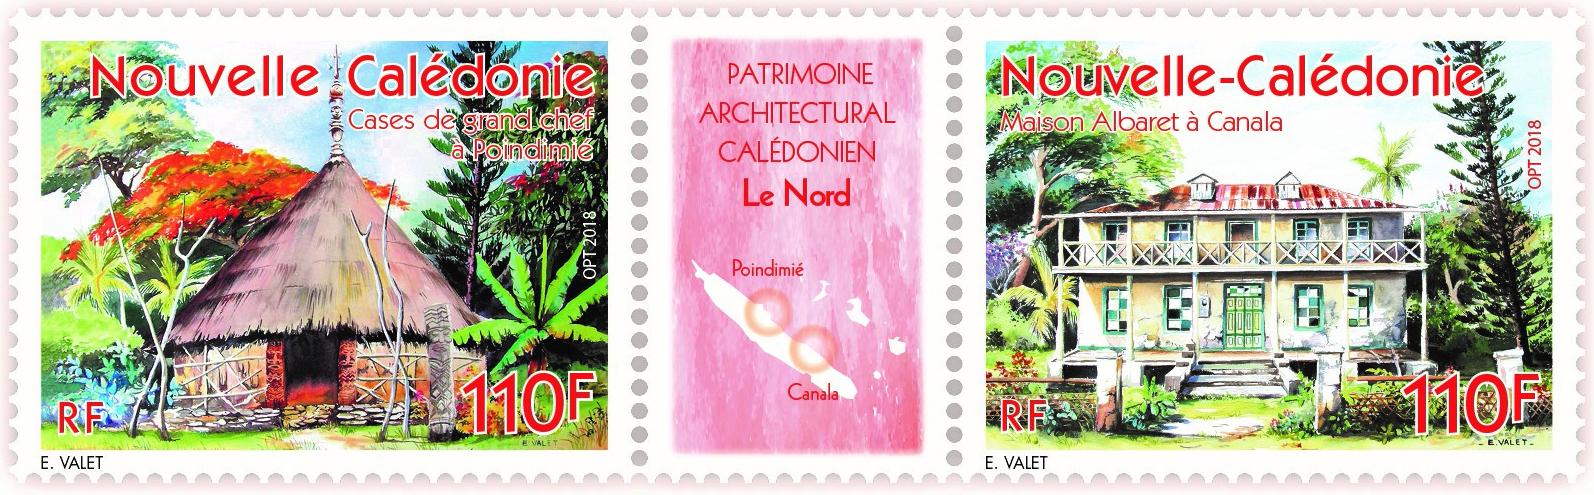 timbre_patrimoine_architectural_caledonien_-_le_nord_-_eric_valet.jpg